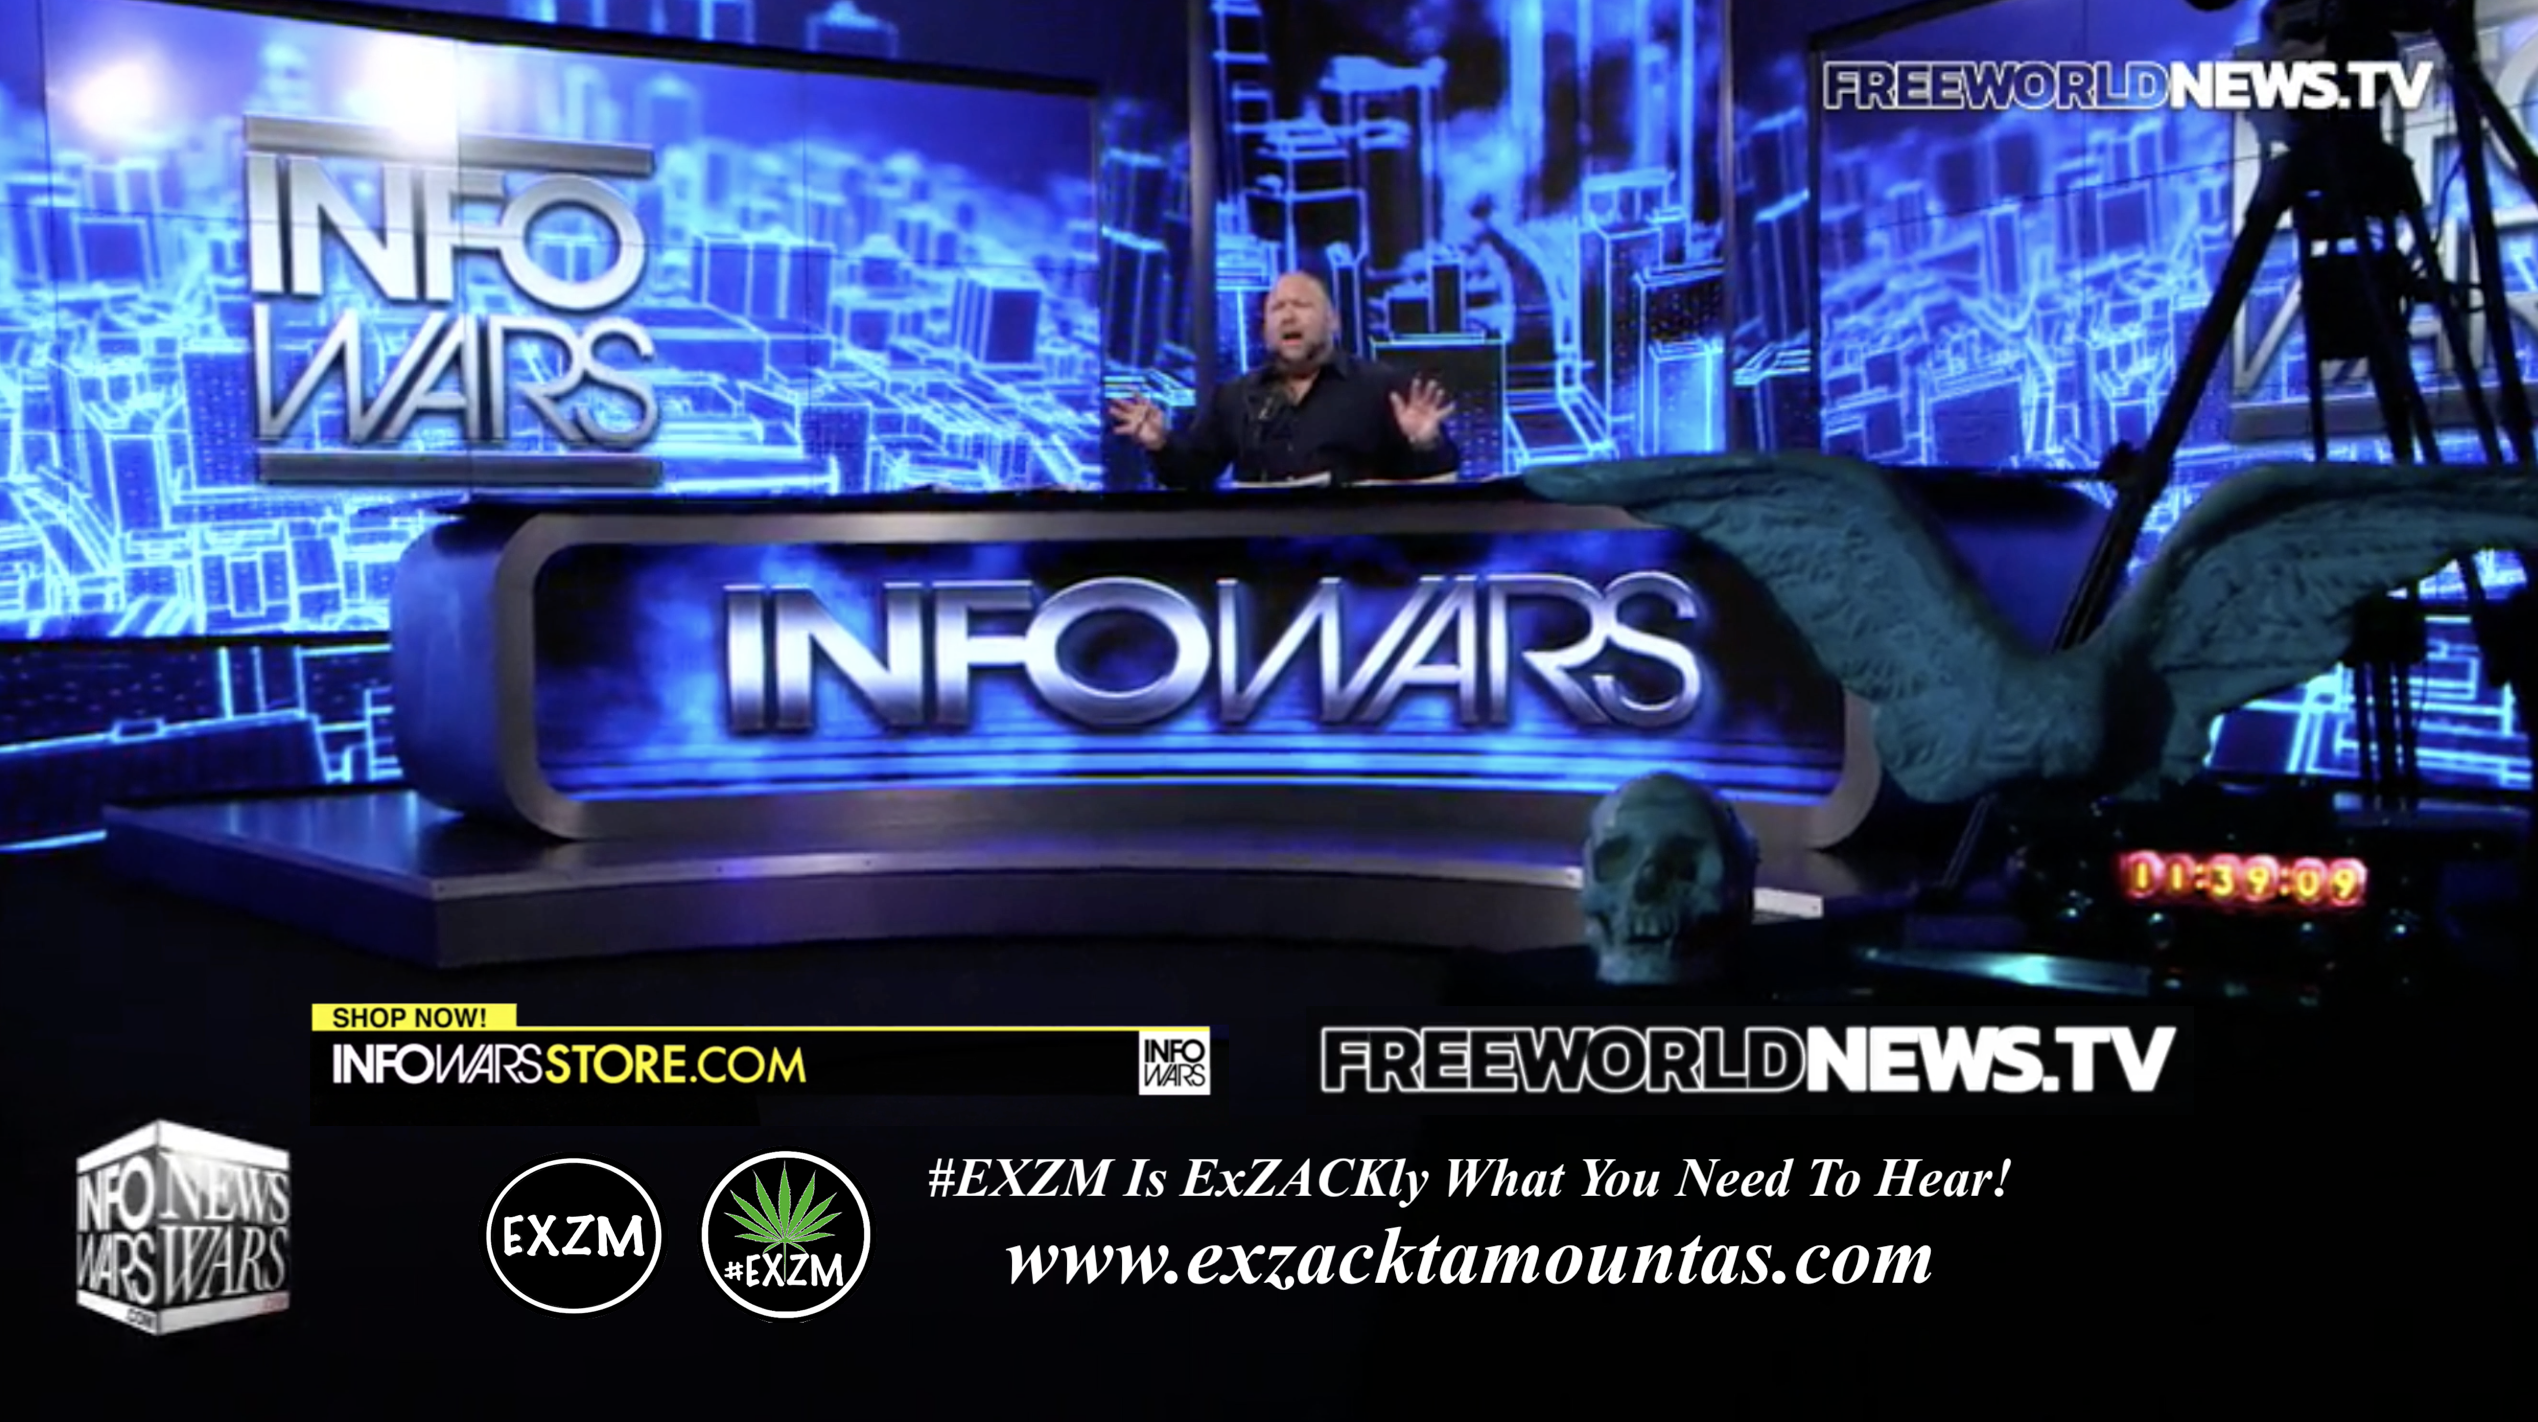 Alex Jones Live In Infowars Studio Free World News TV EXZM Zack Mount August 3rd 2021 copy